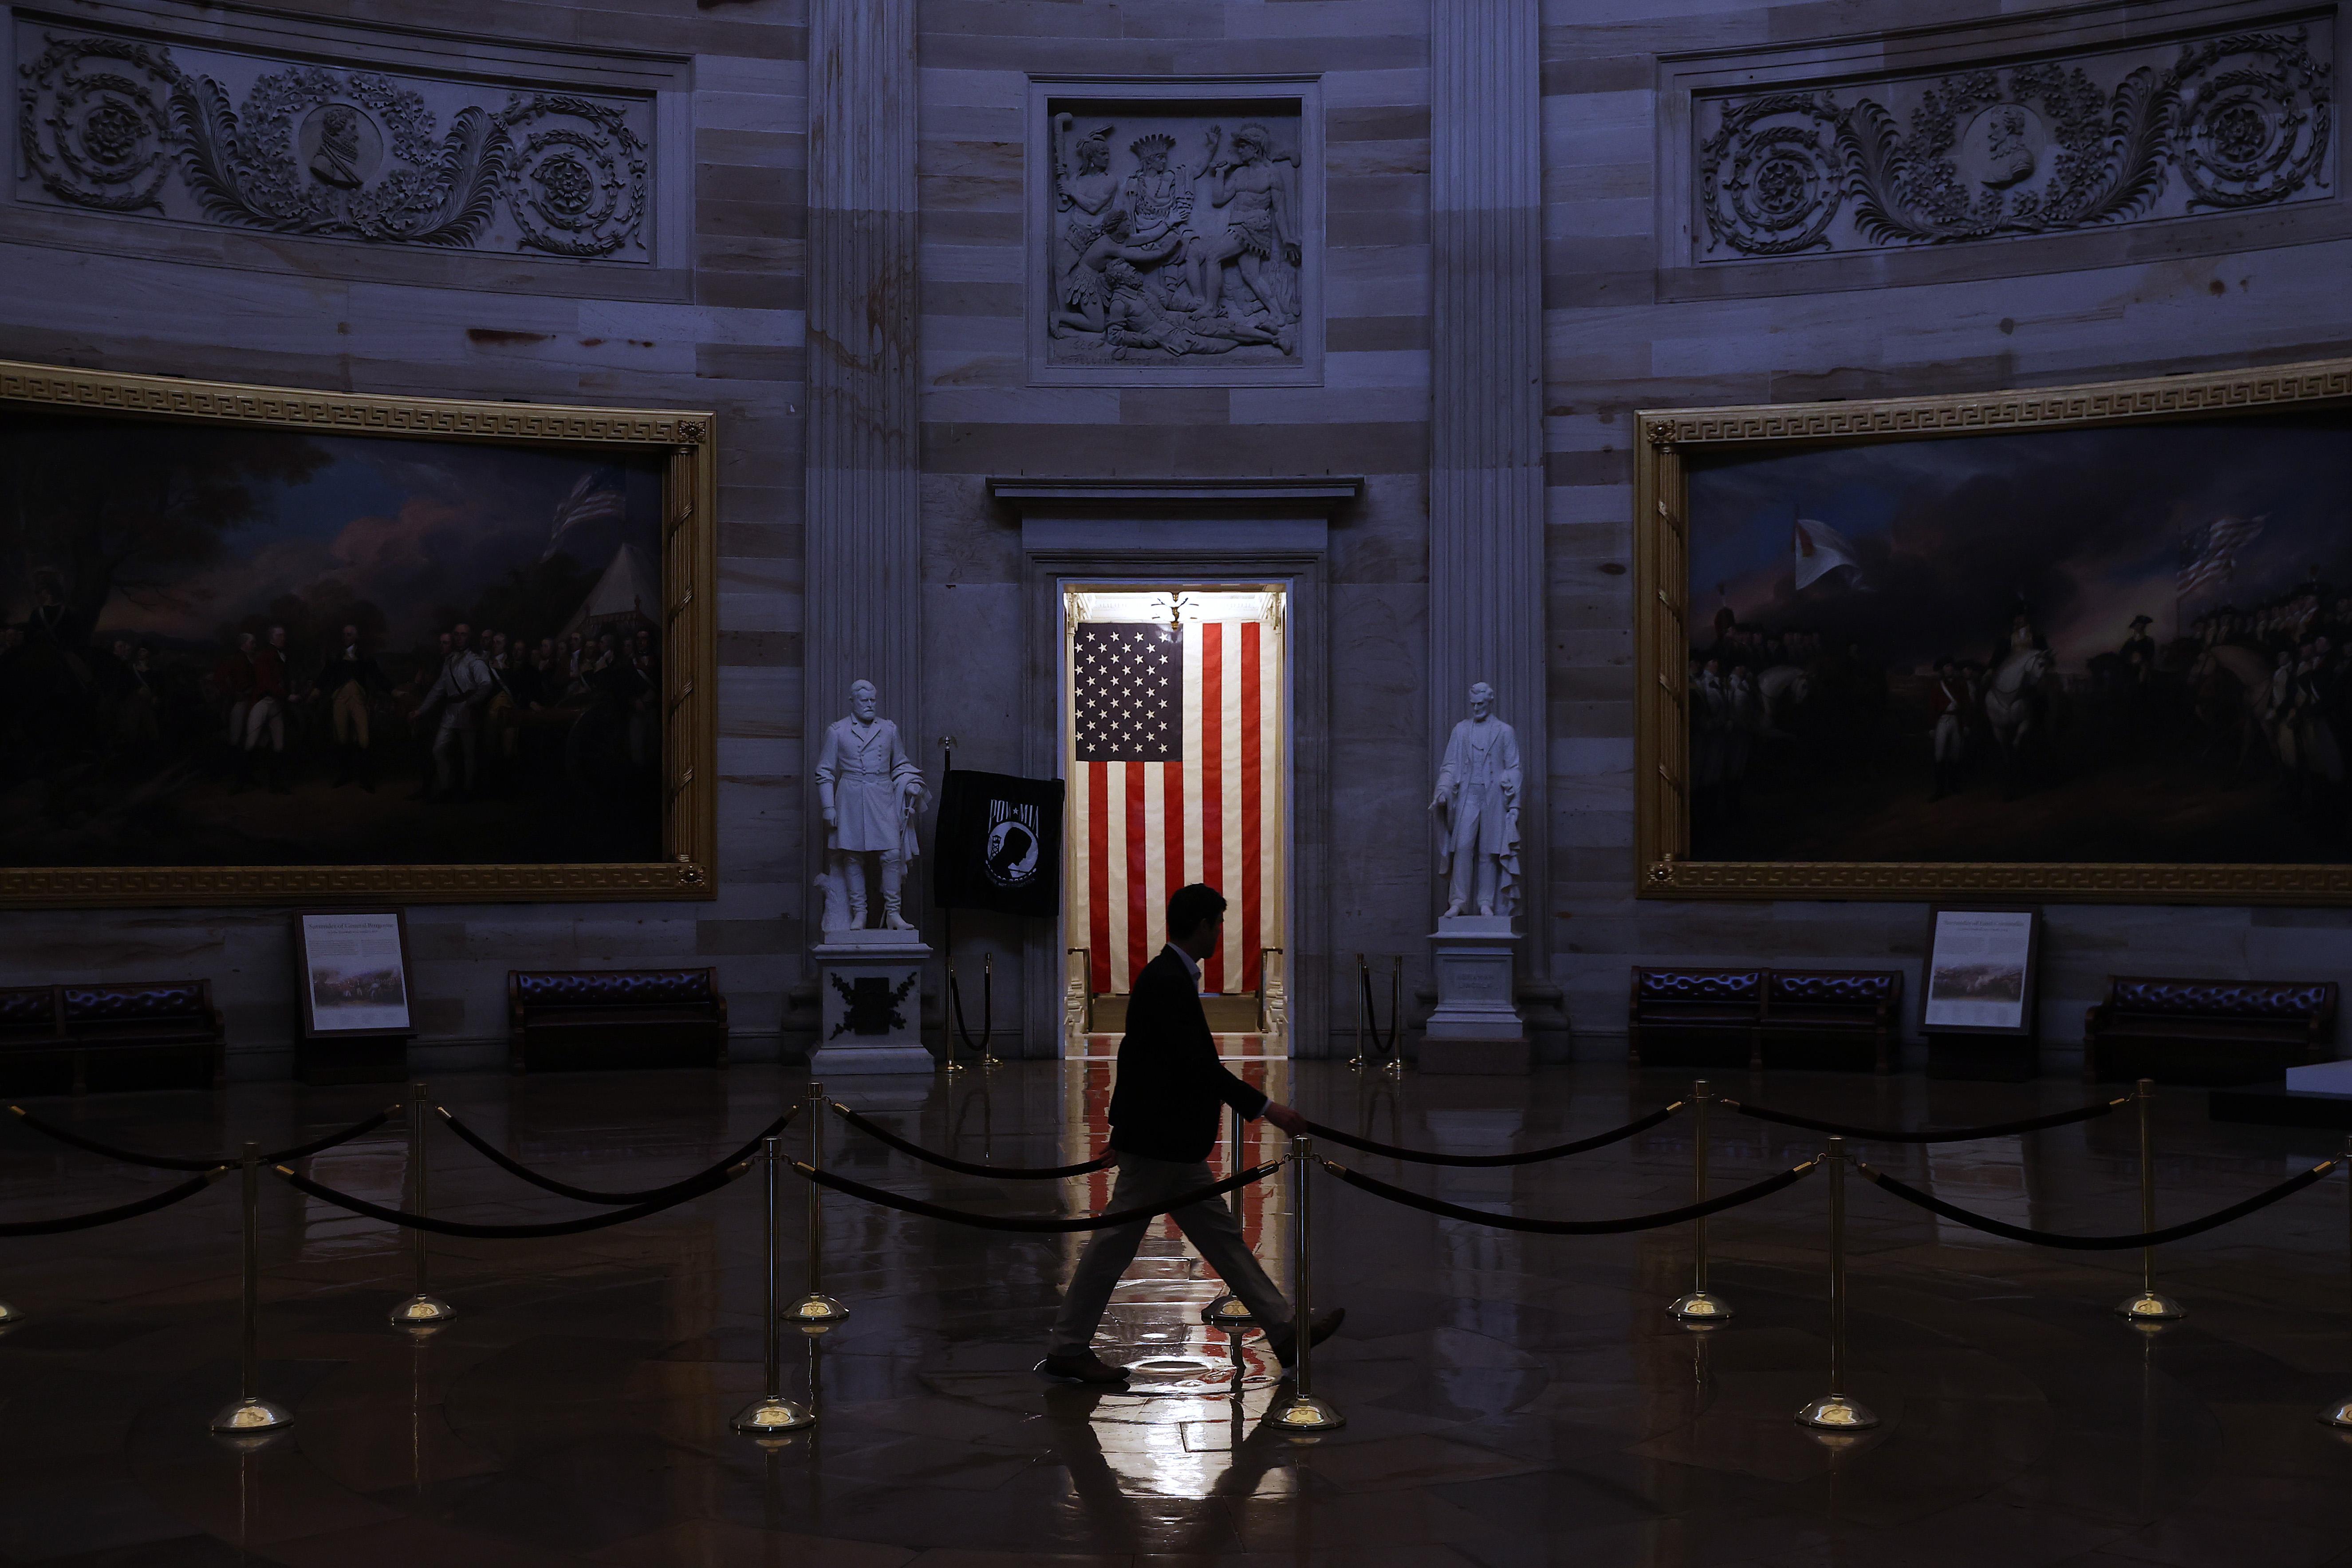 A man walks through the empty U.S. Capitol Rotunda, empty